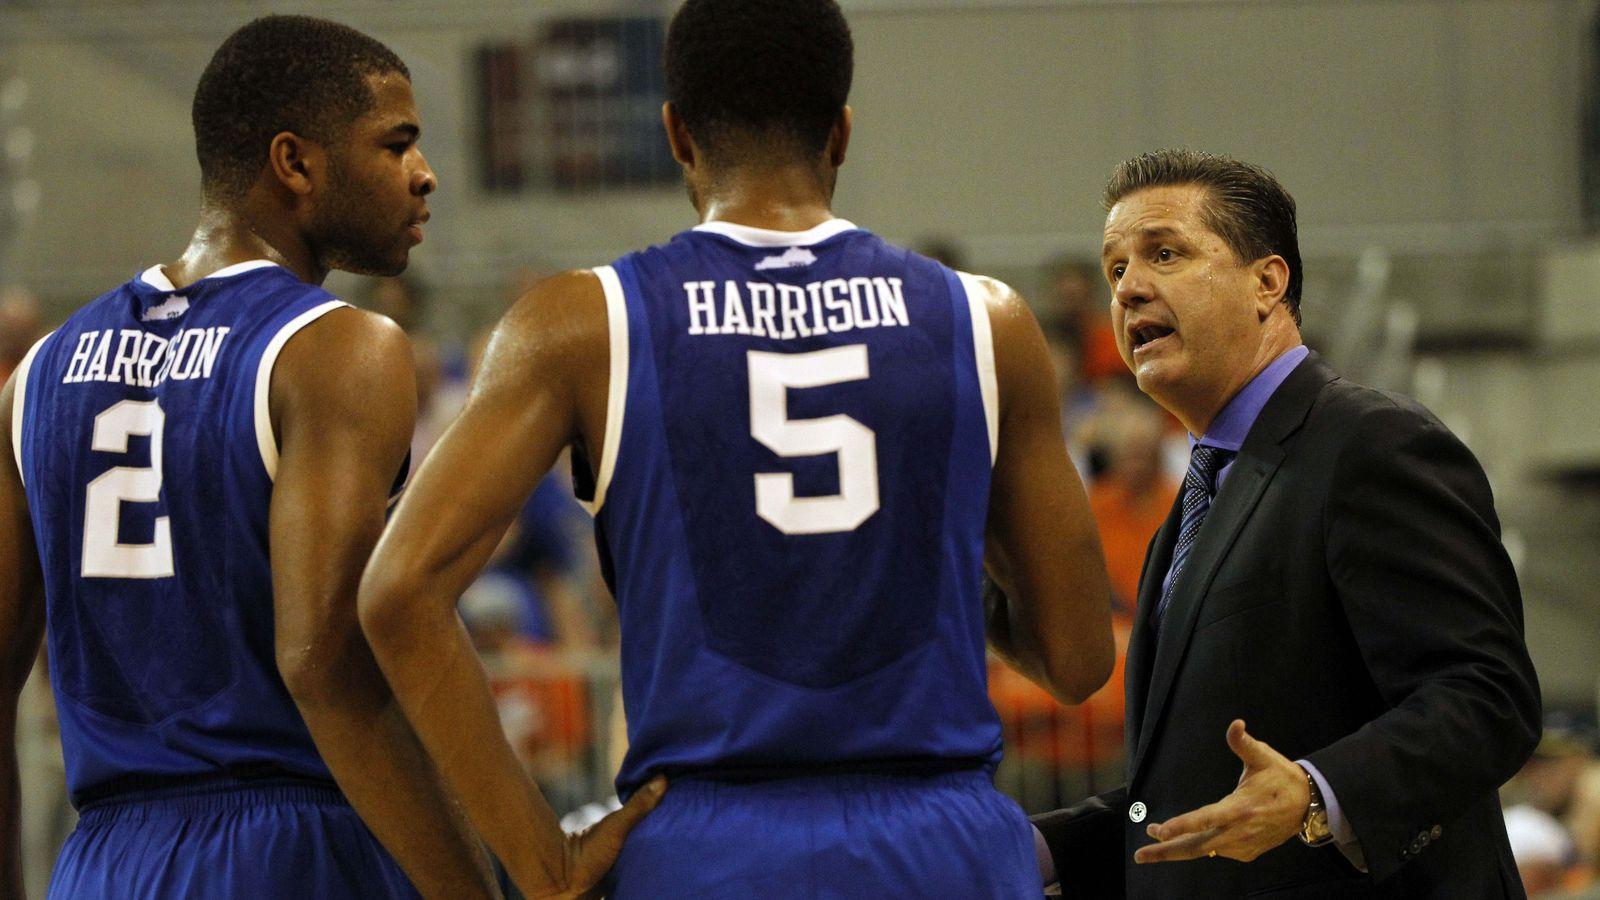 2013 2014 Kentucky Basketball Roster: Kentucky Basketball: 2013-14 Season Postmortem Part 3